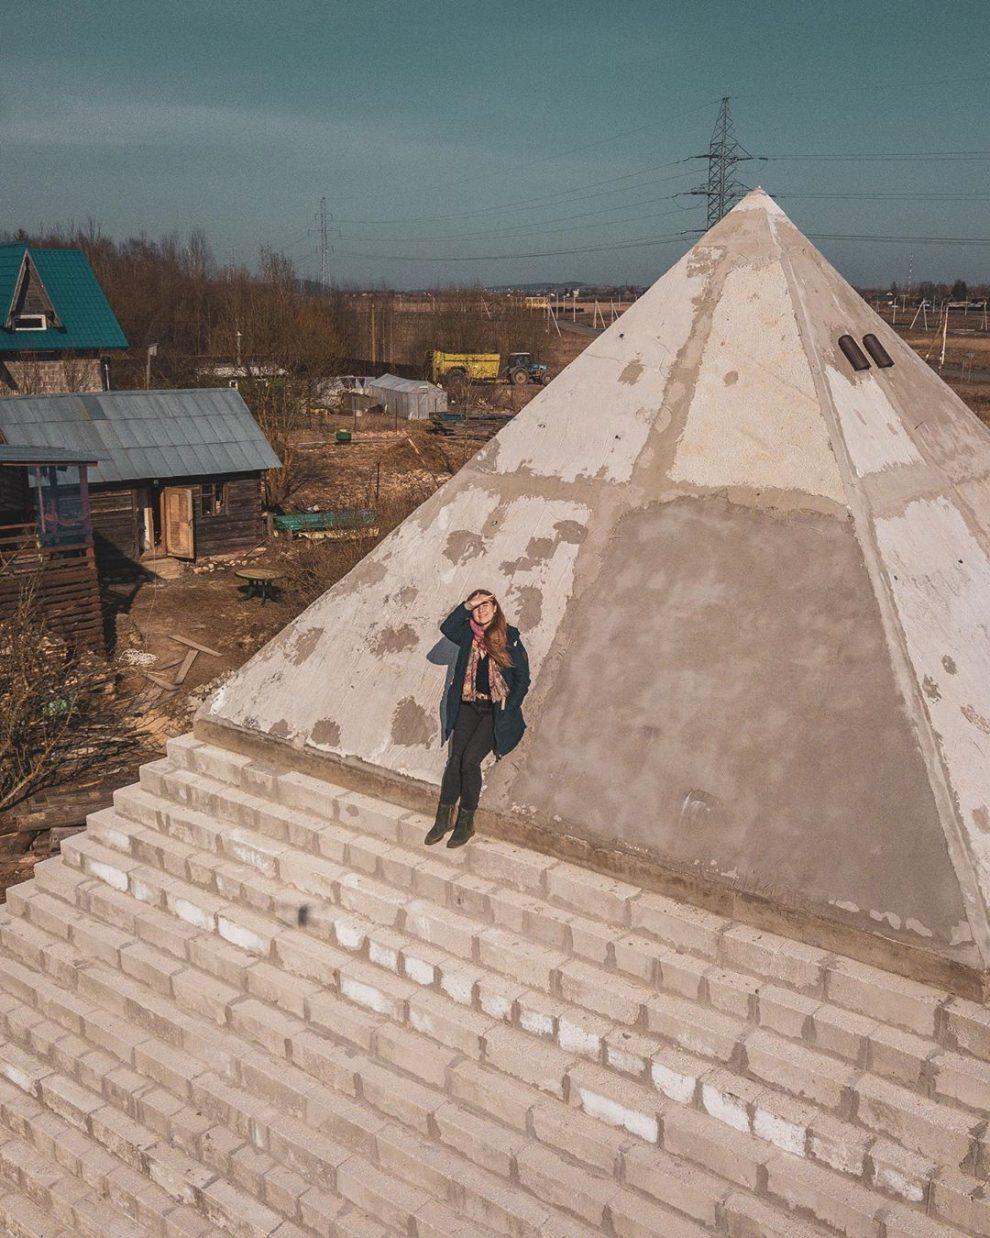 piramide casera